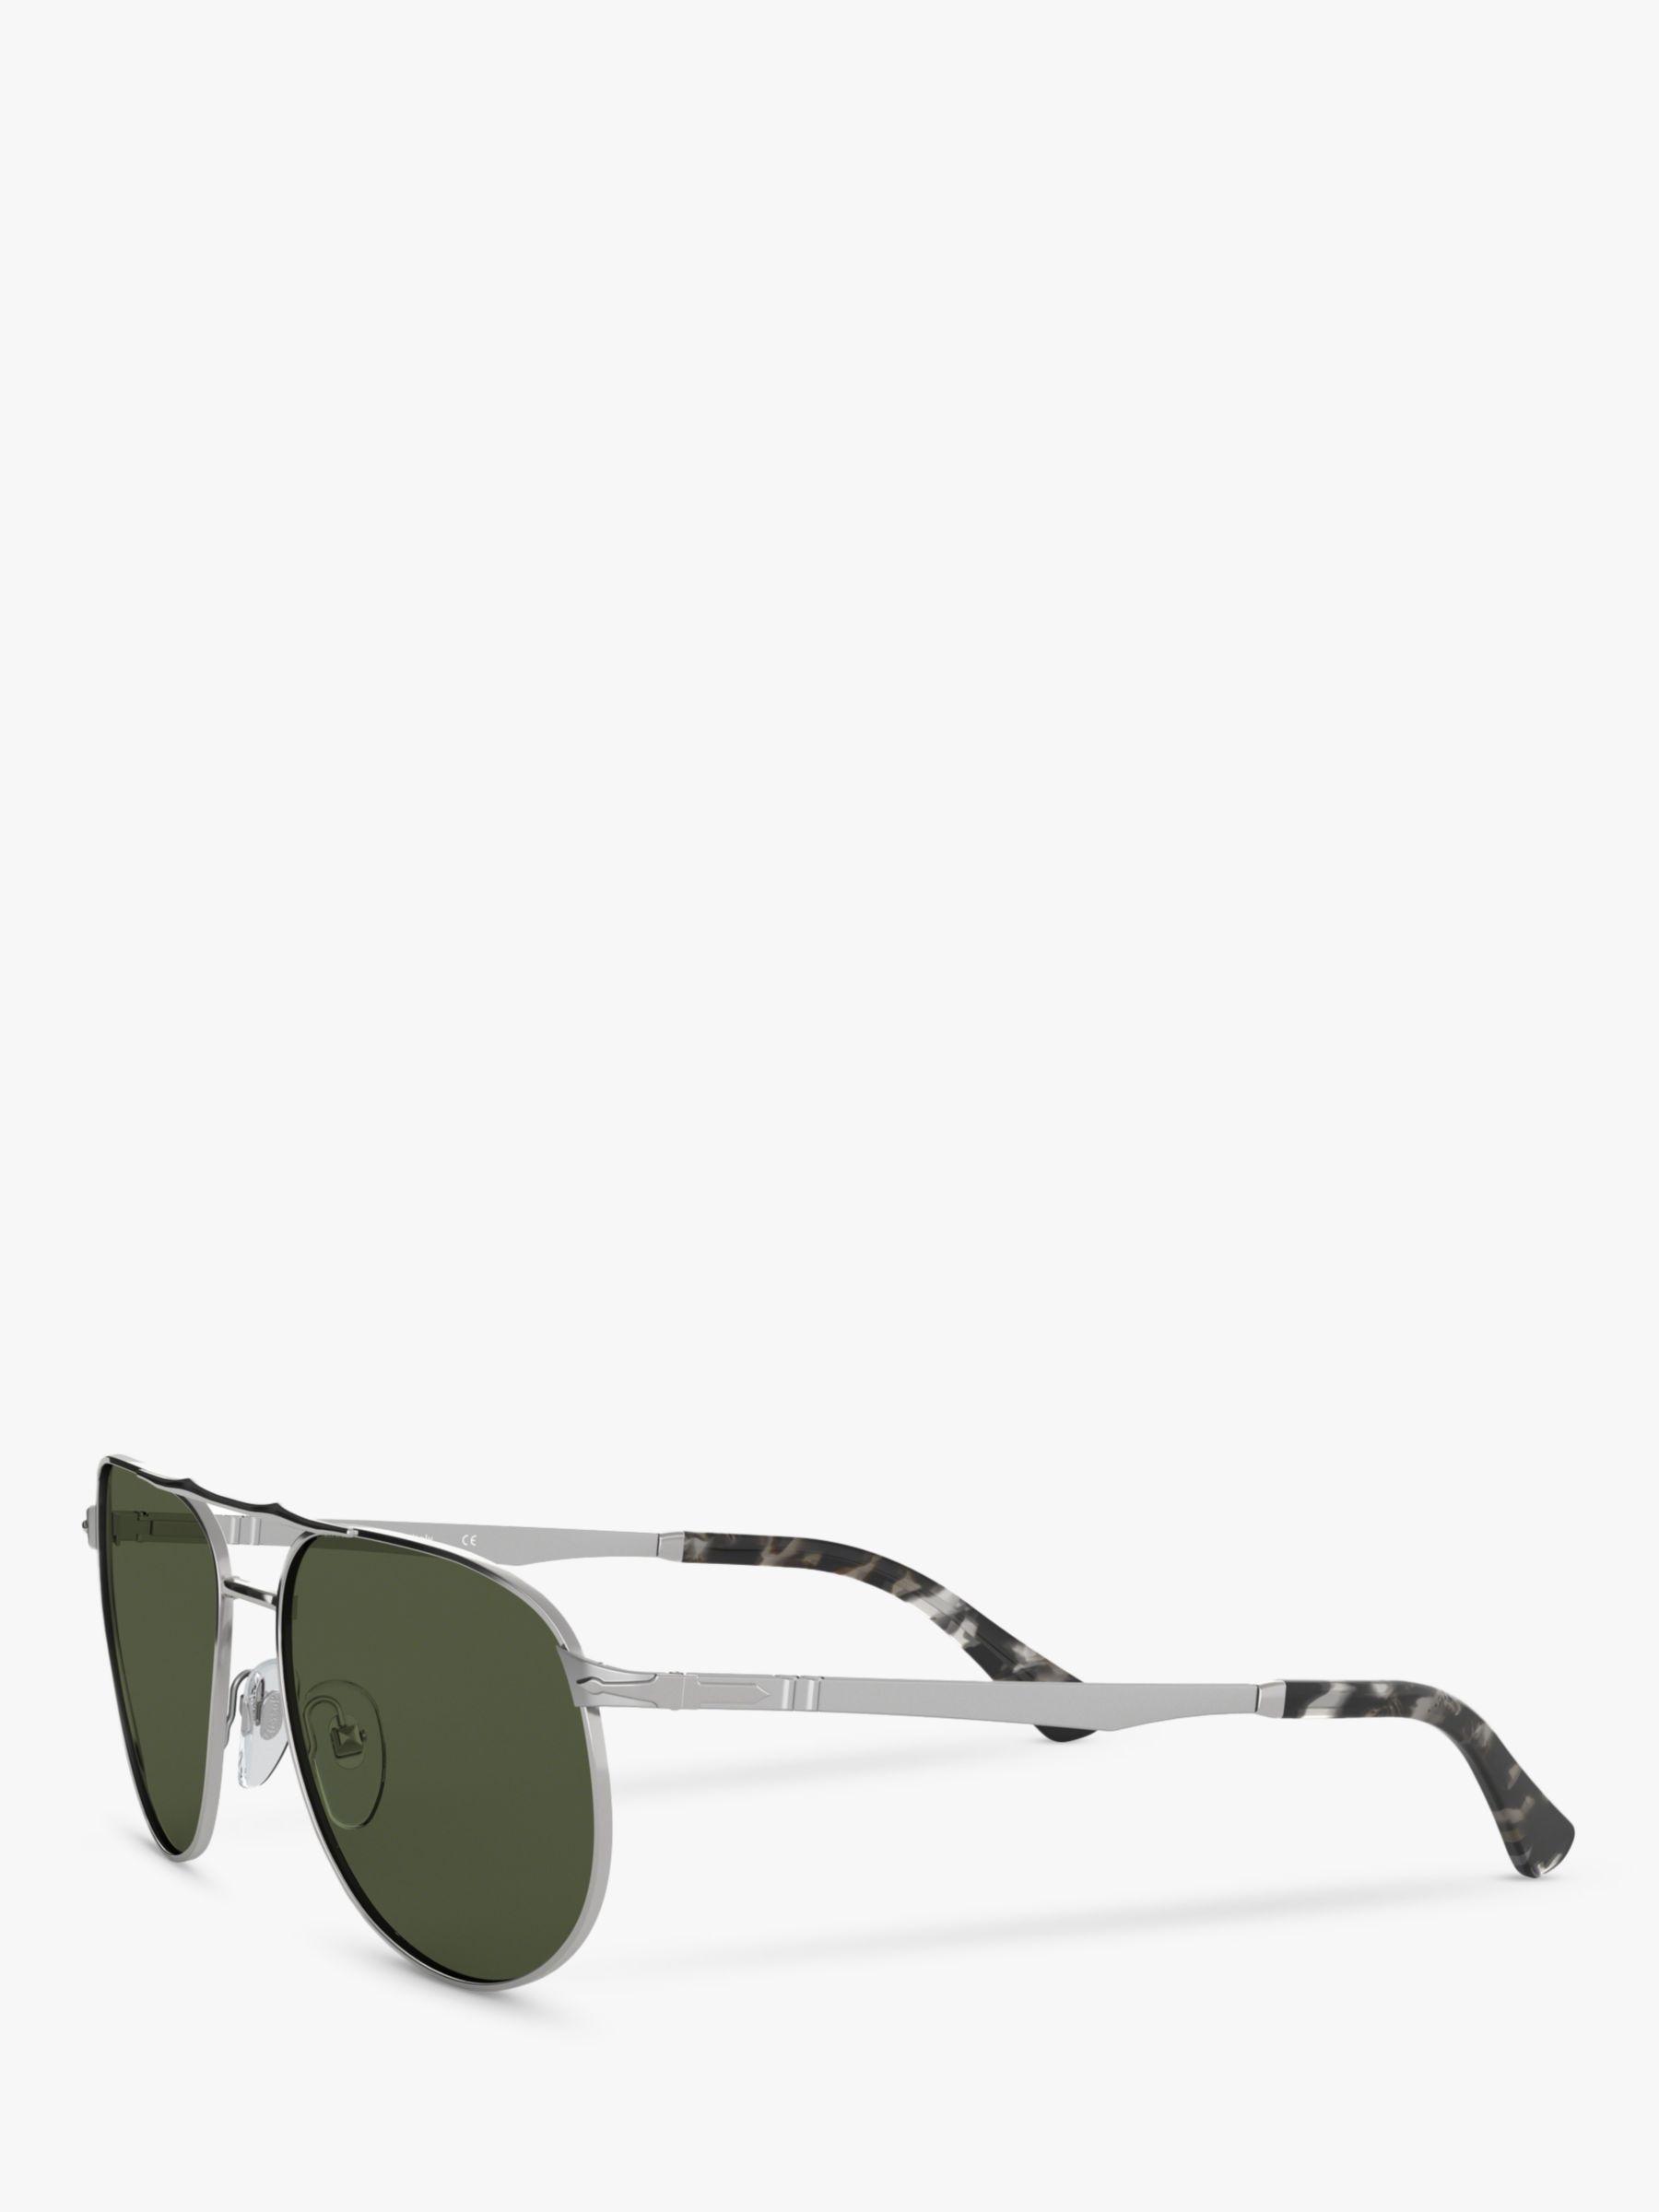 573ae3d955c9 Persol Po2455s Men's Oval Sunglasses in Green for Men - Lyst